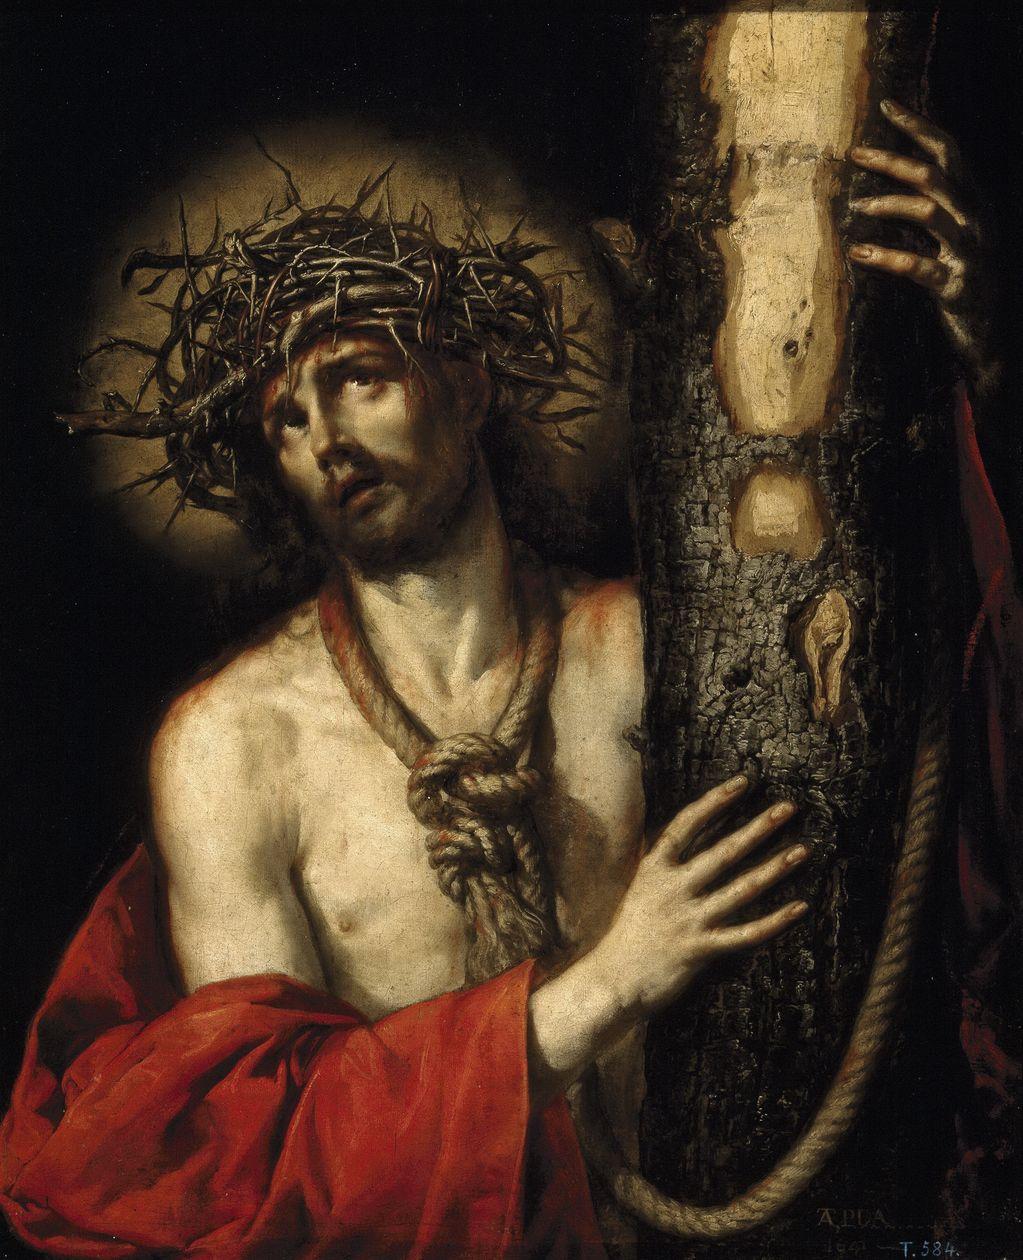 Антонио де Переда-и-Сальгадо (1611-1678) Христос Скорбящий